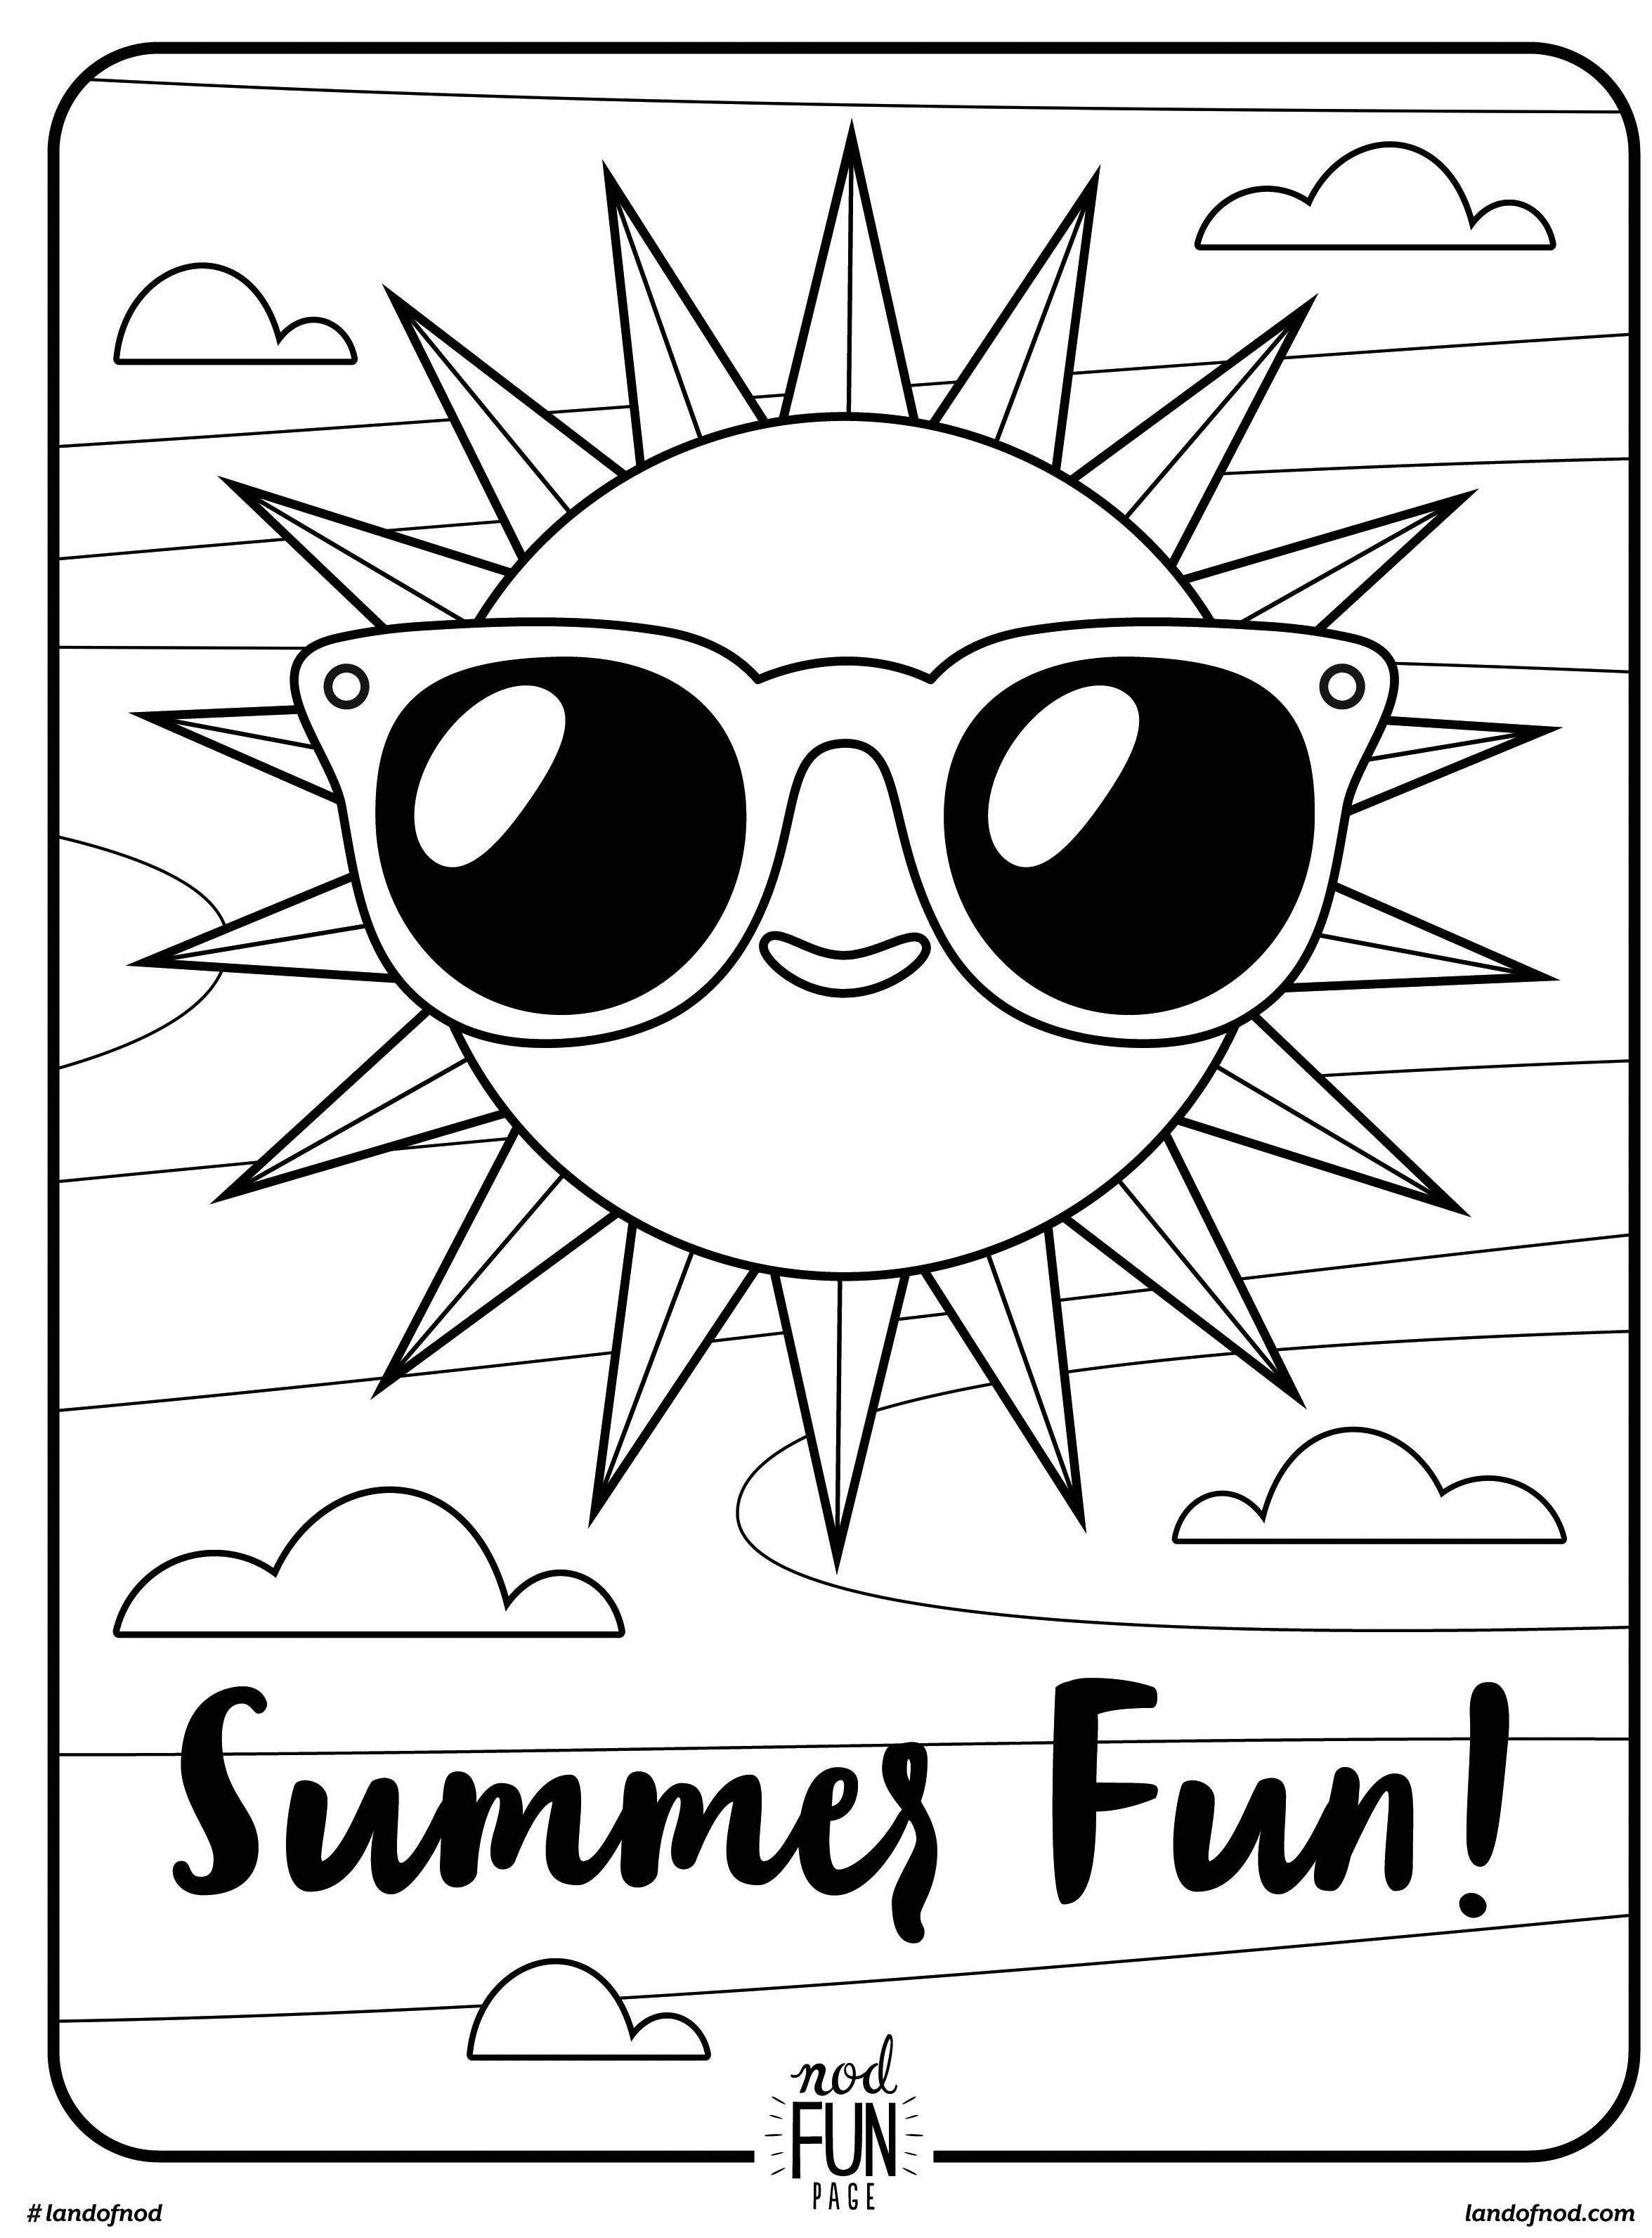 Free Printable Coloring Page Summer Fun